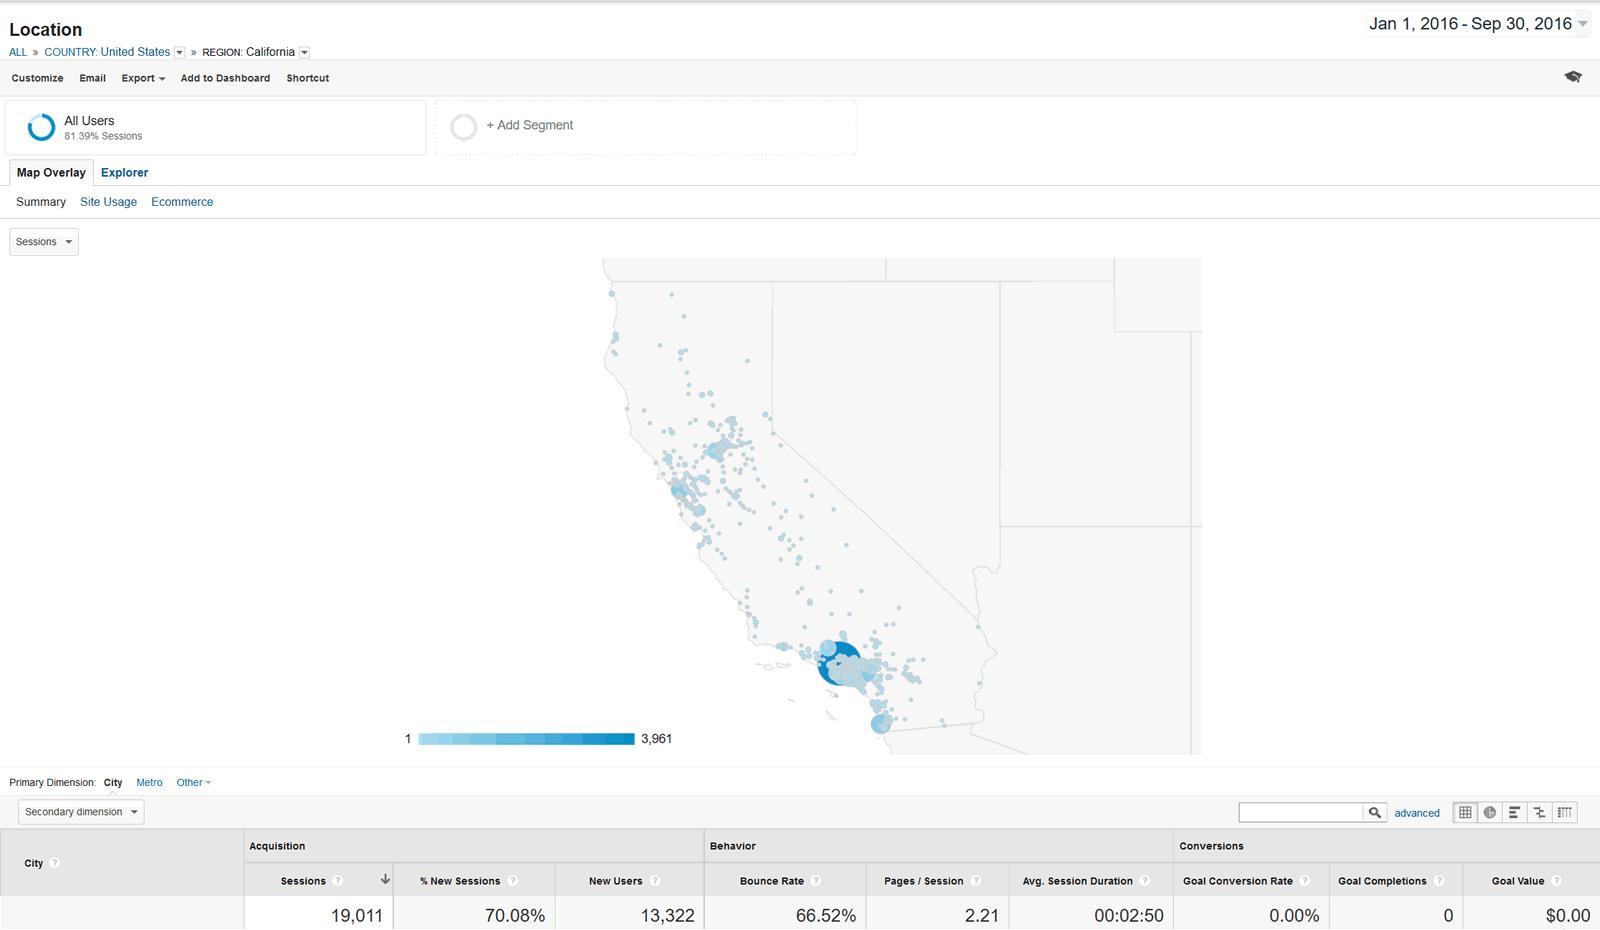 Google Analytics - Location - 2016-01-01 through 2016-09-30